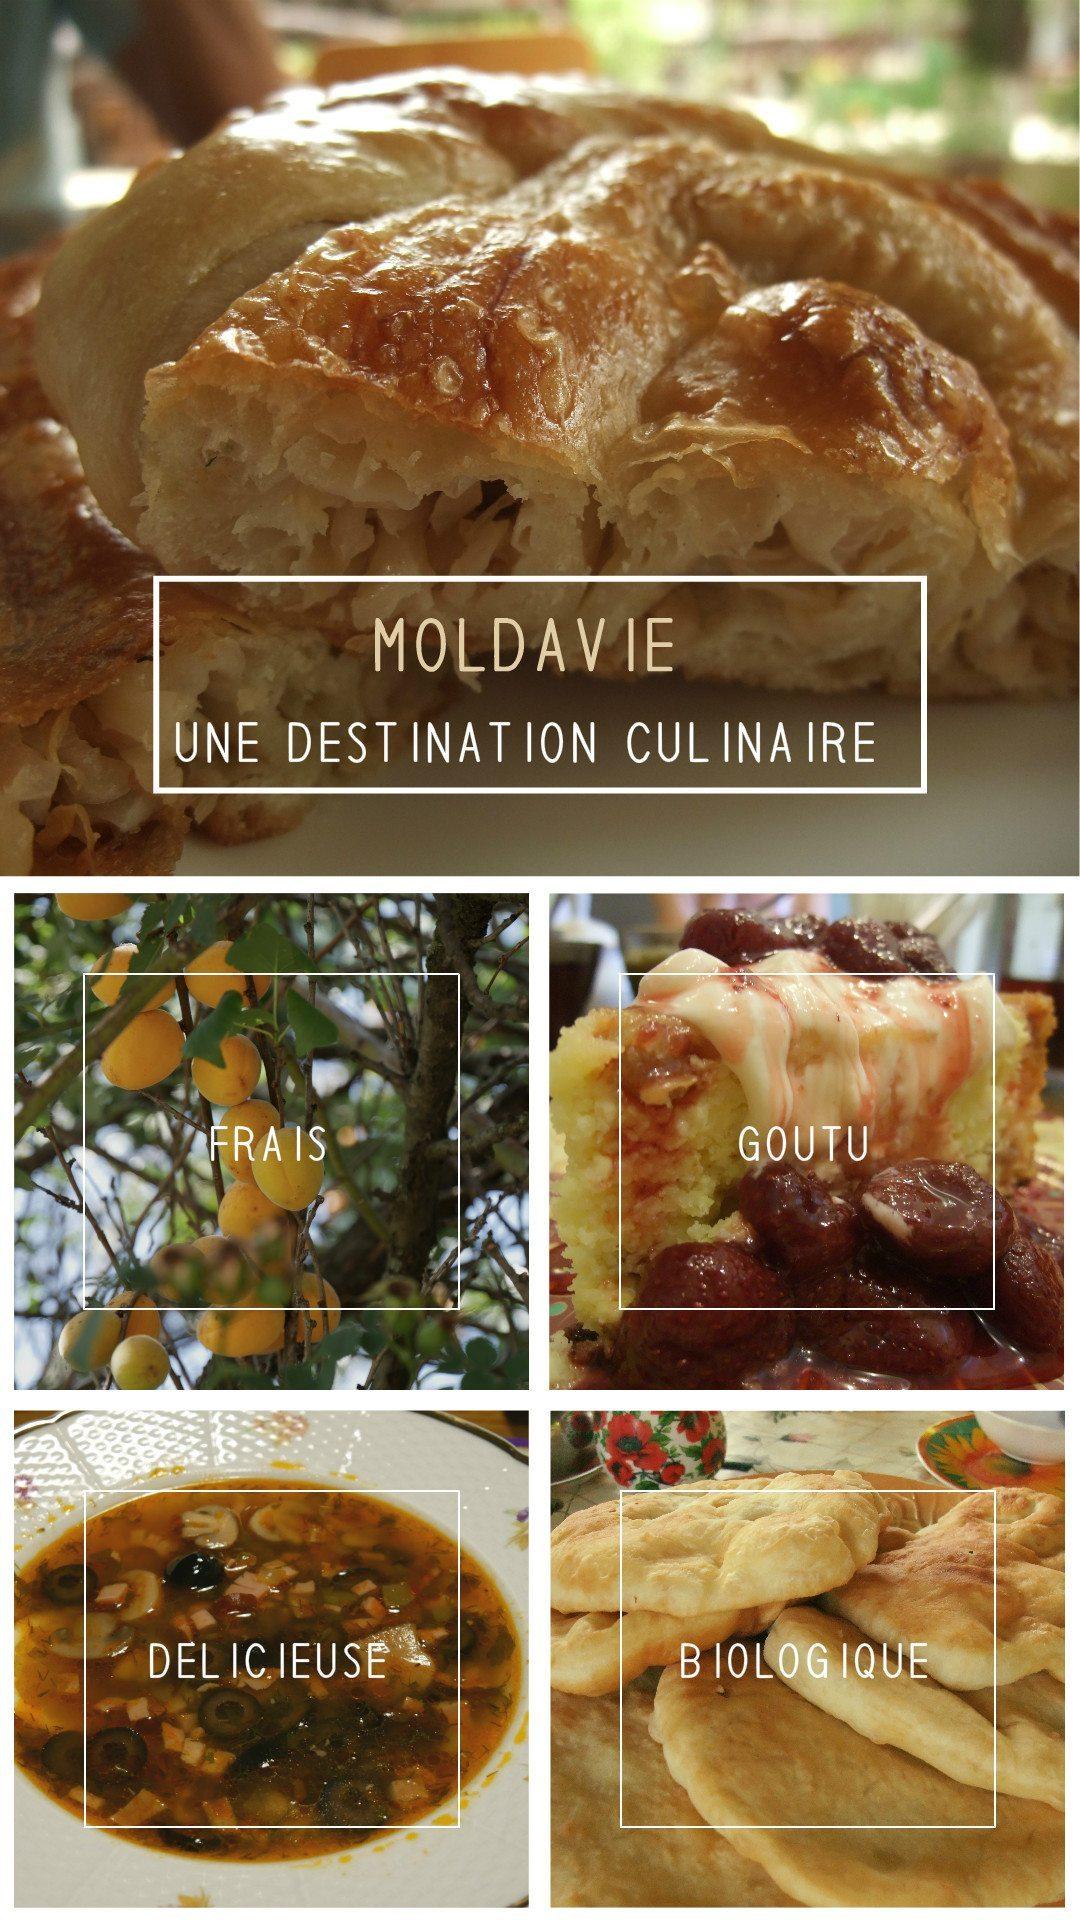 moldavie nourriture tourisme